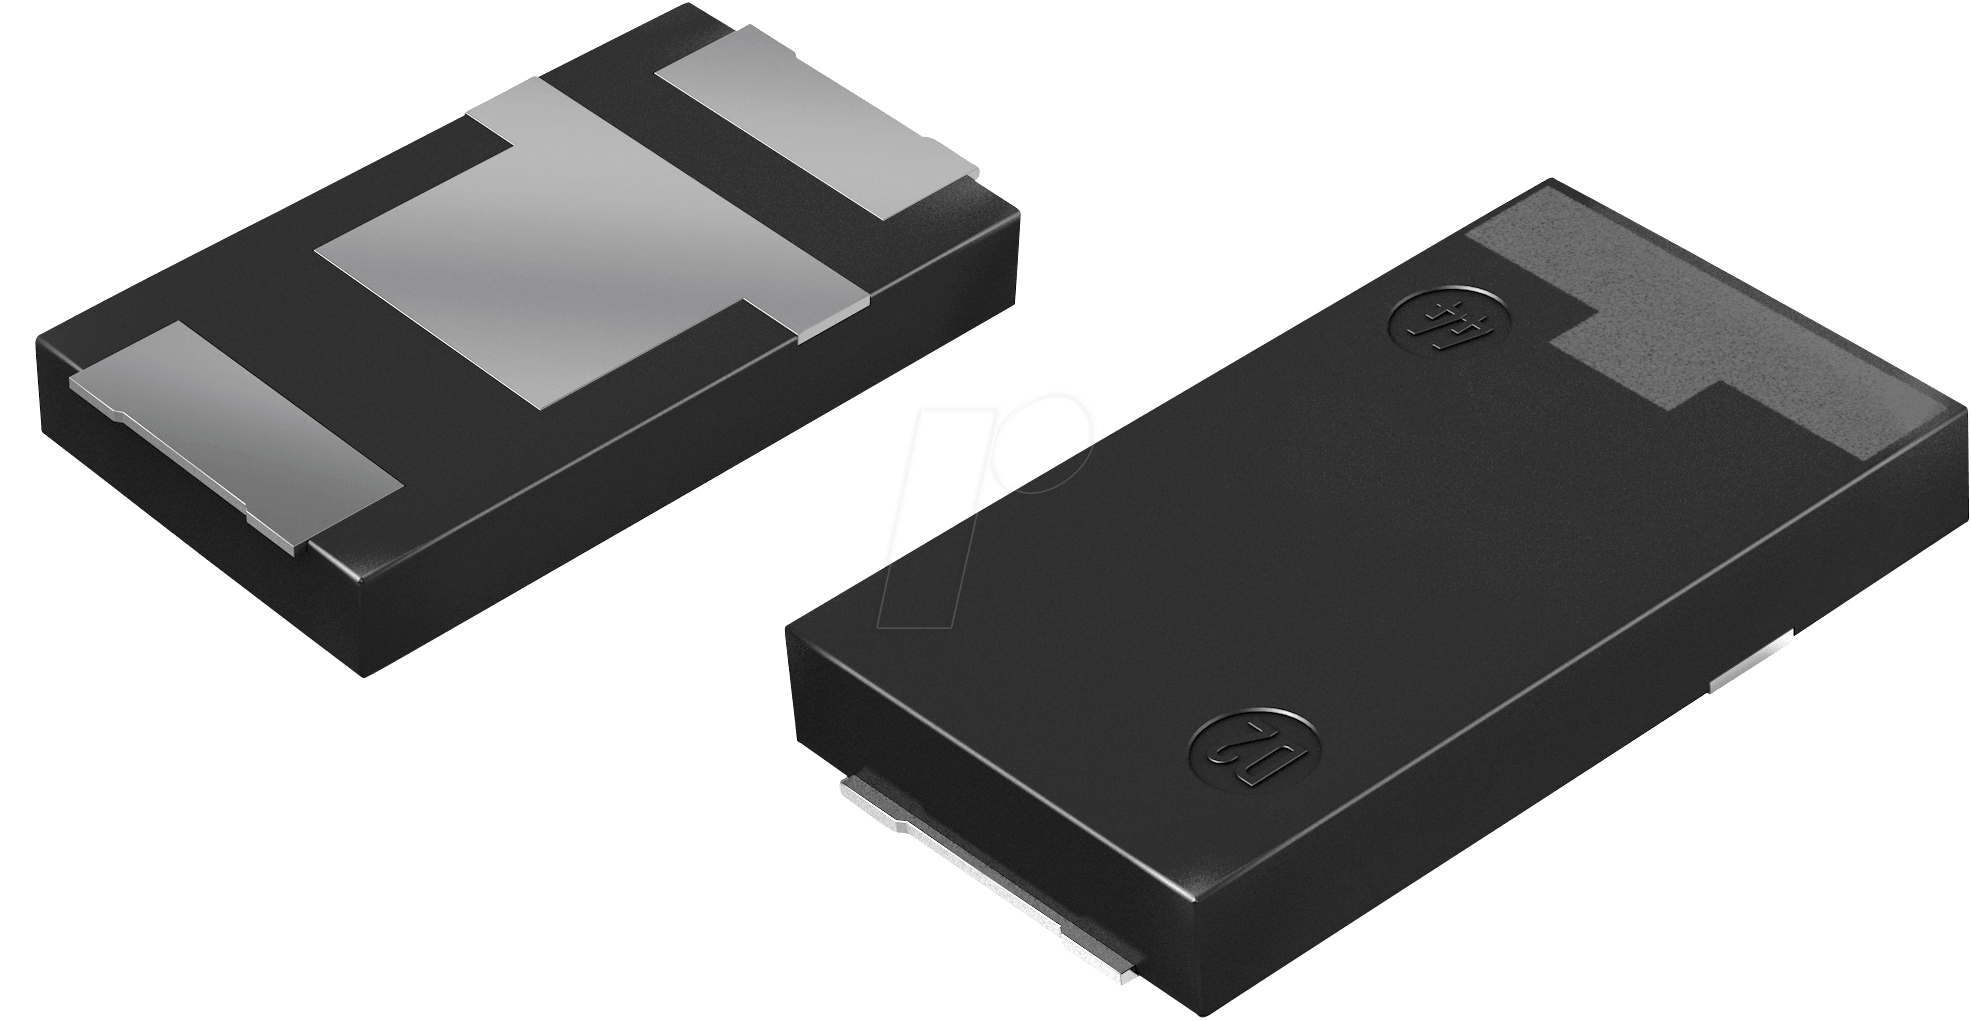 POSC 150/10D-40 - SMD Tantal, 150 uF, 10 V, 2000 h